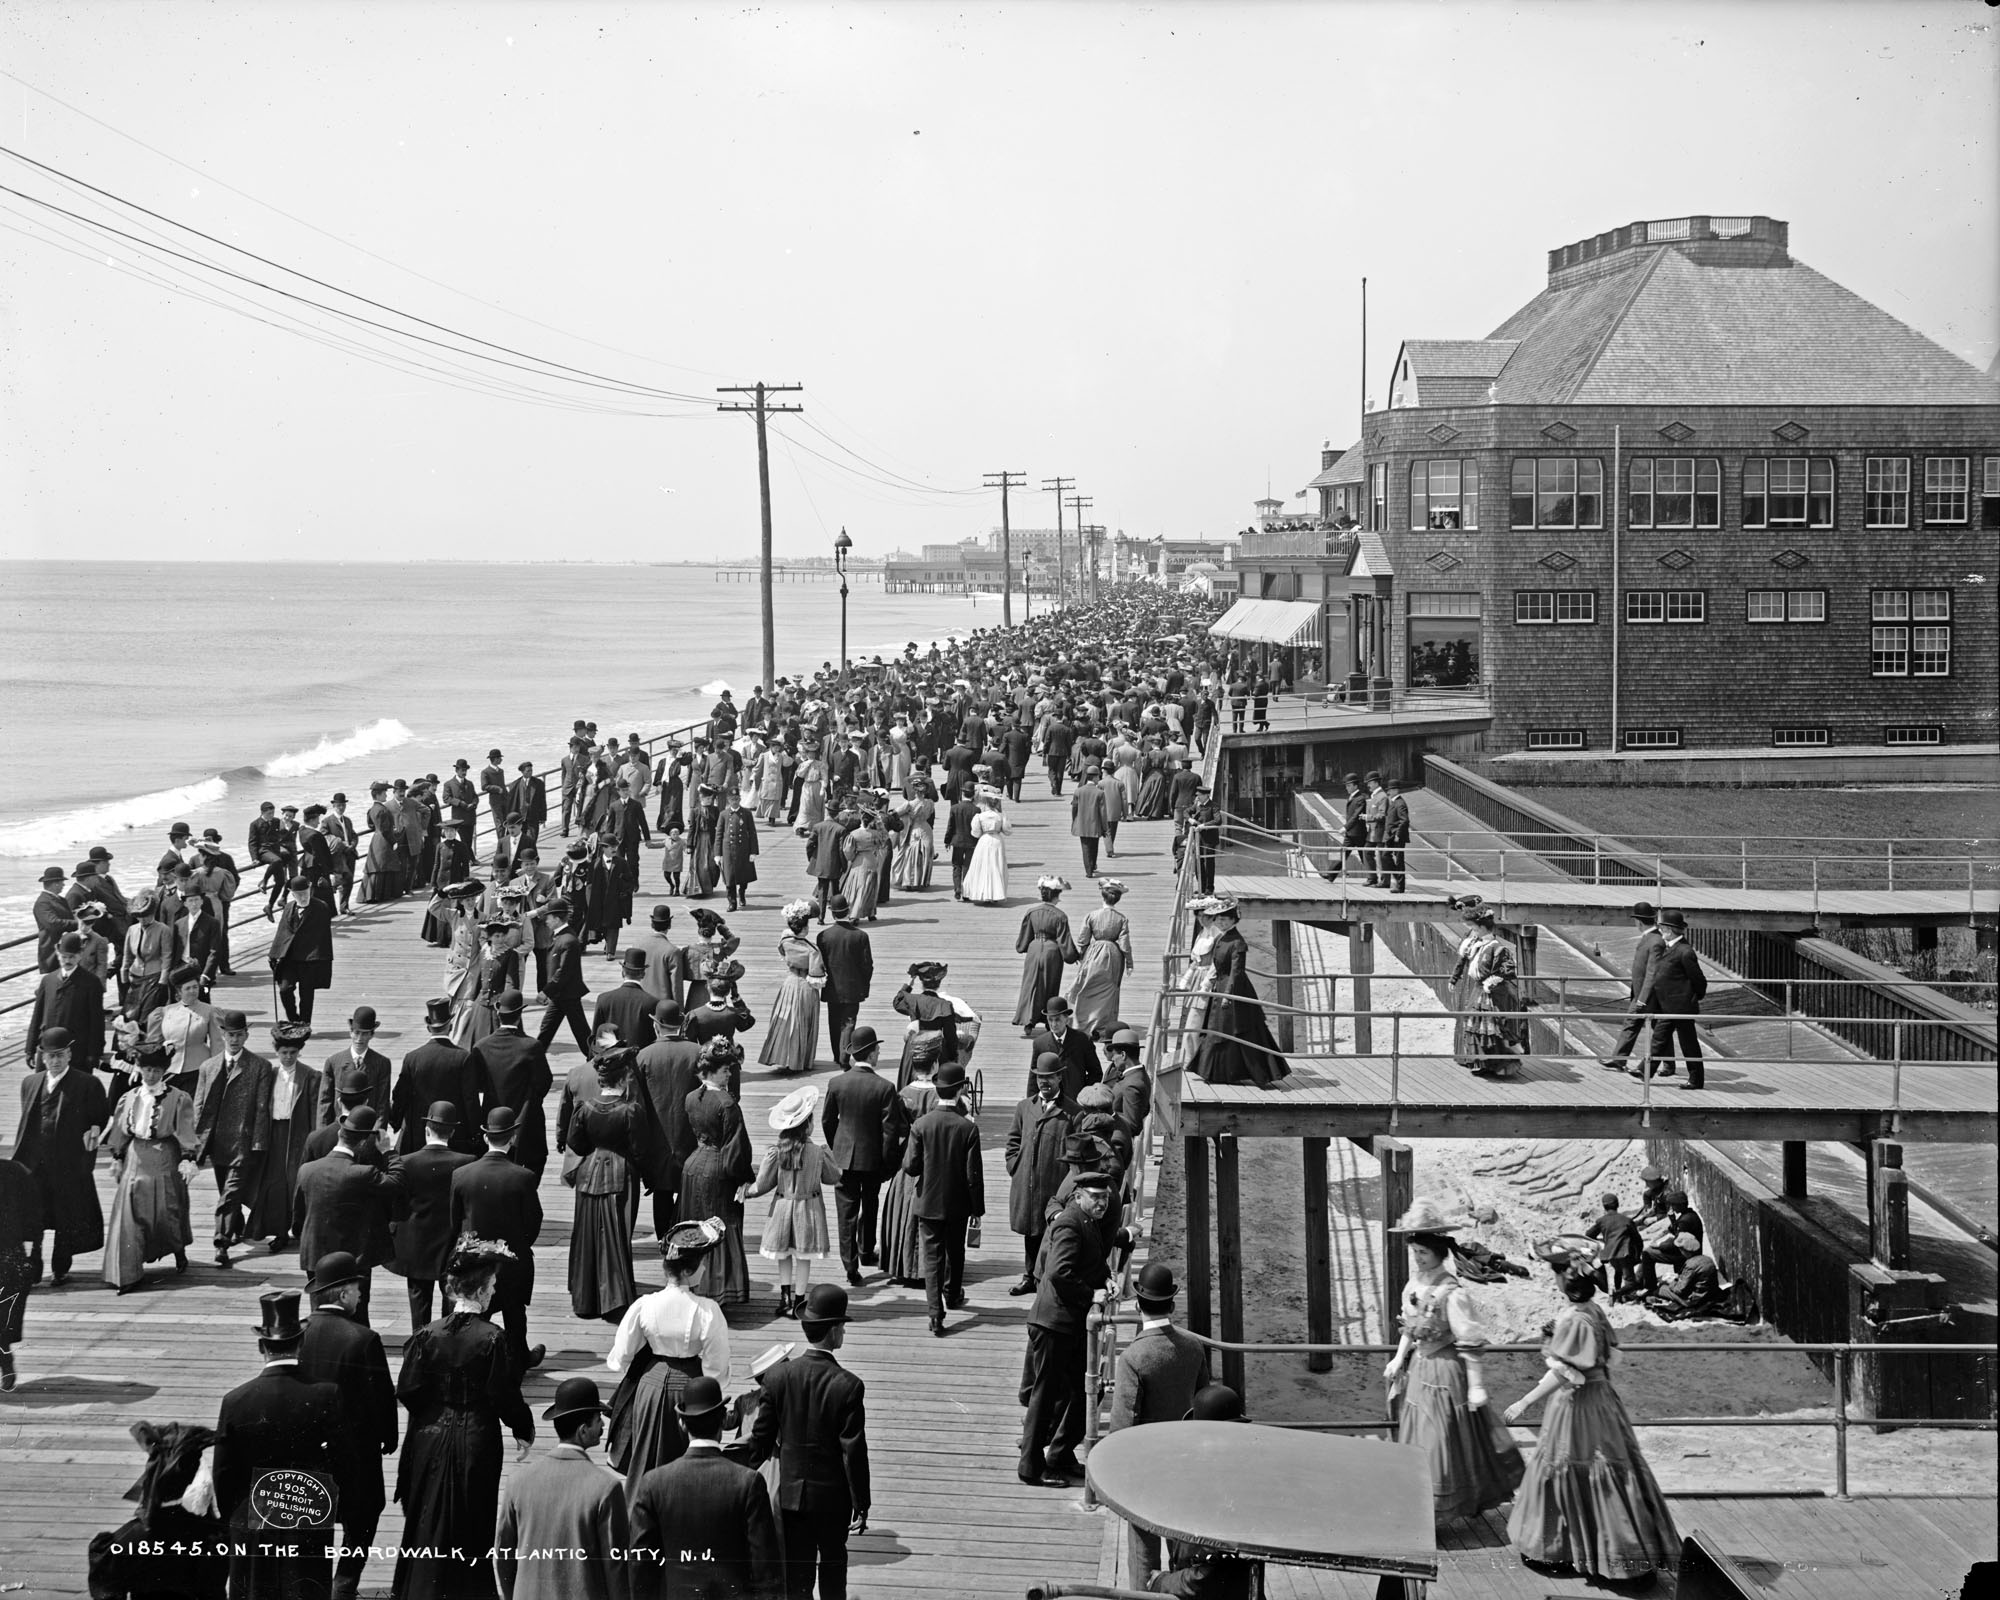 The Boardwalk, Atlantic City, N.J. (1905)